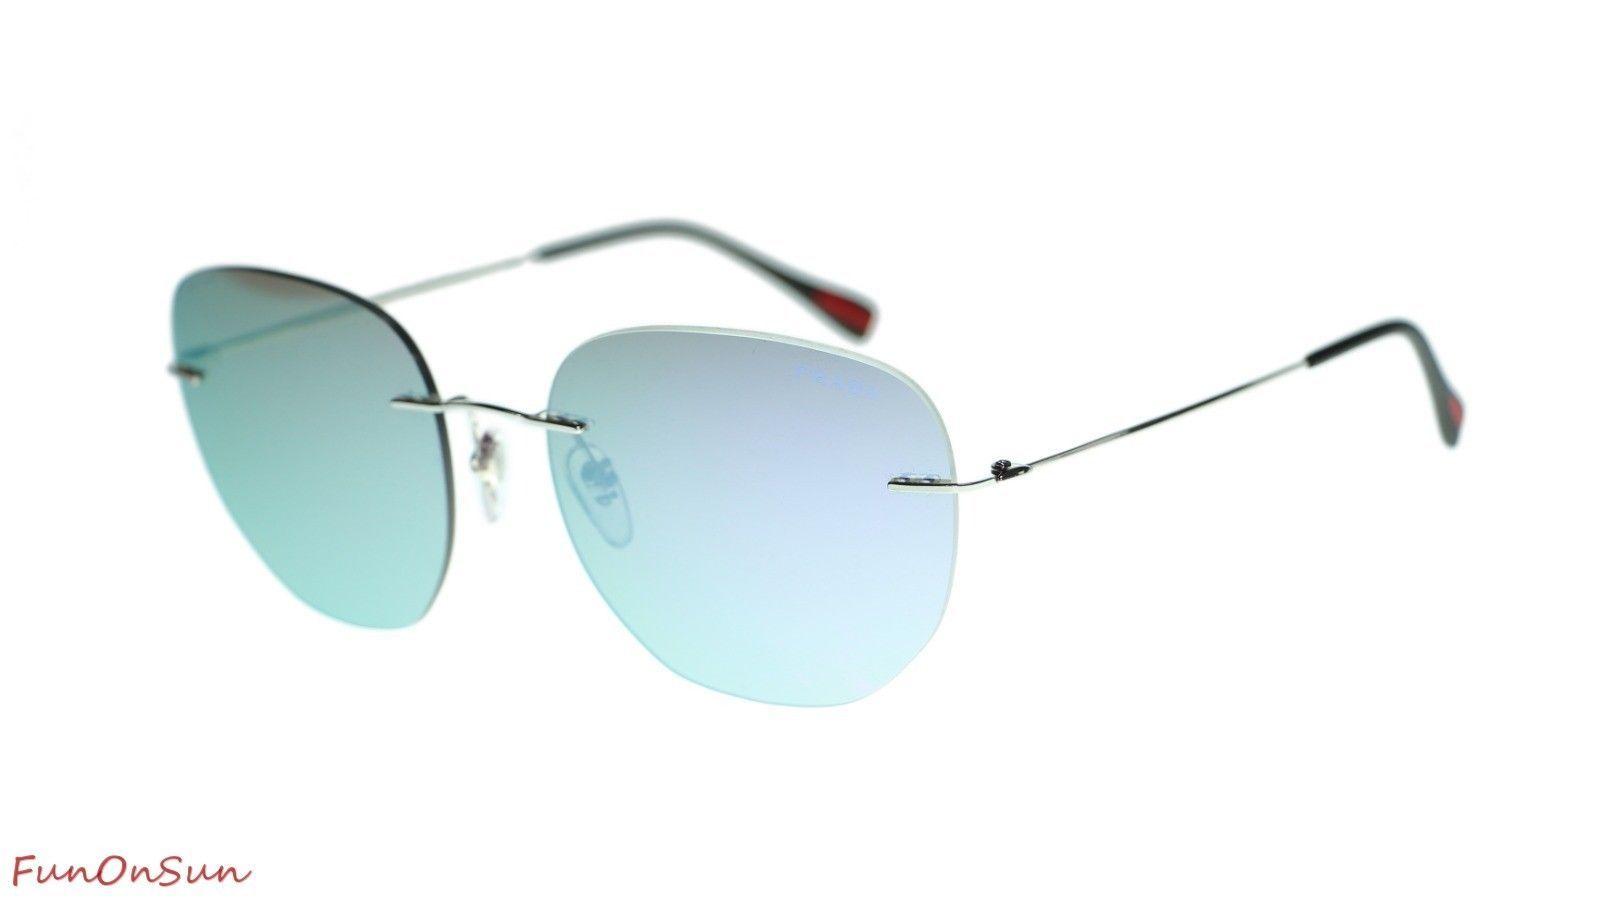 Prada Men Sunglasses PS50TS 1BC129 Silver/Grey Mirror Milky Blue Lens 57mm